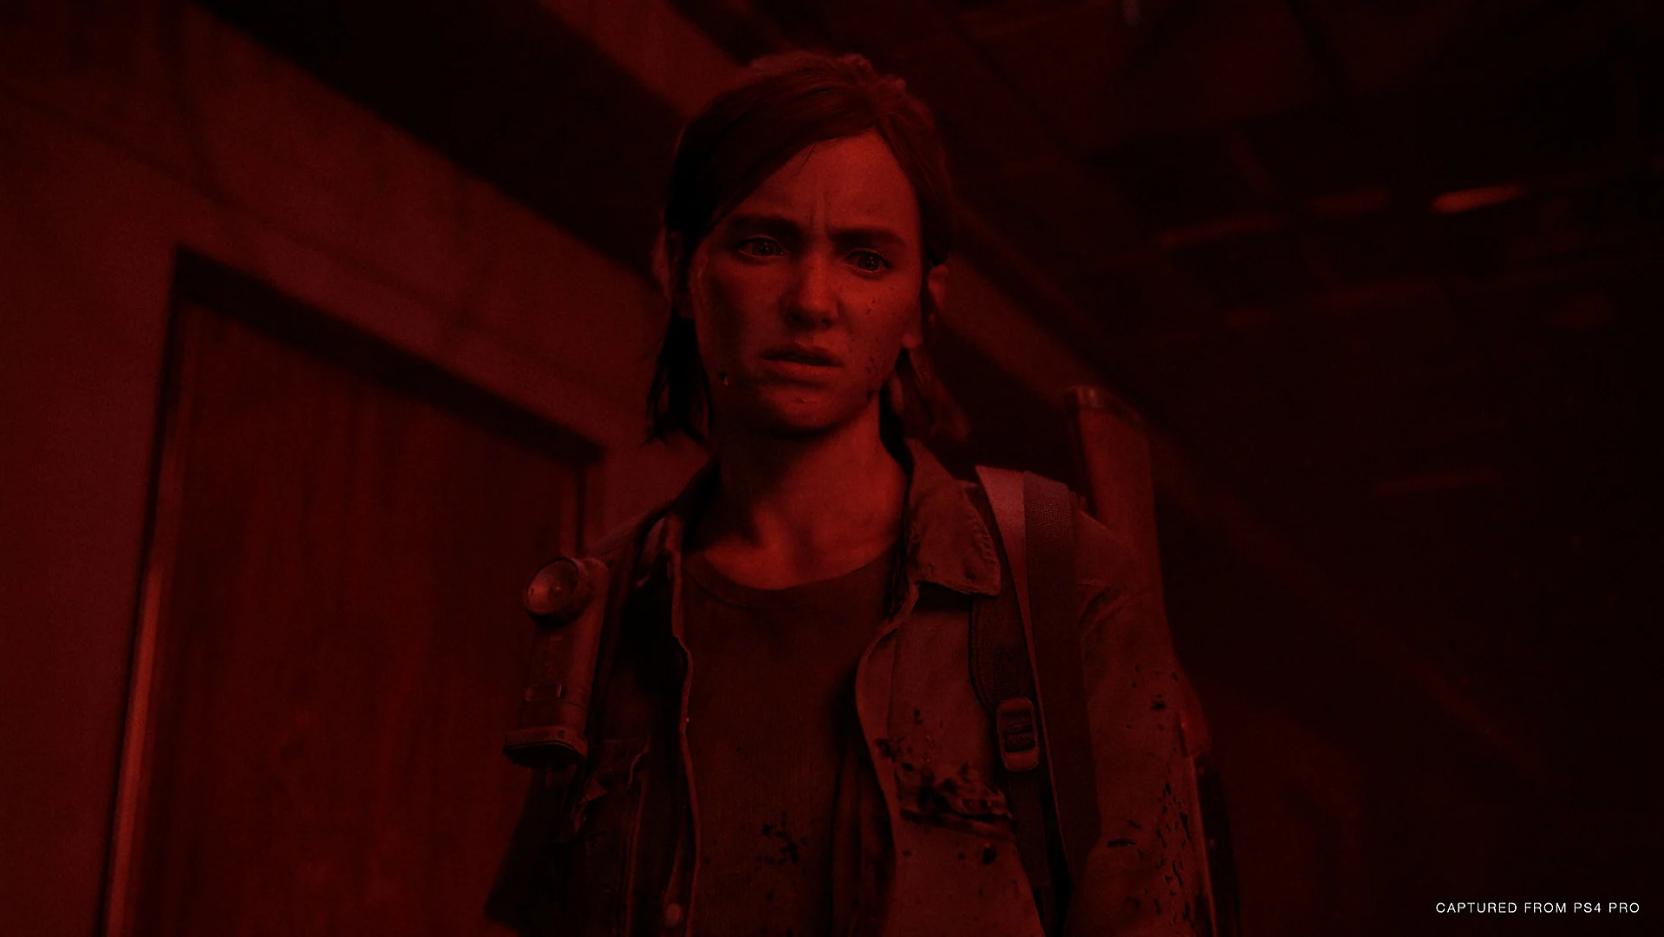 The Last of Us: Part II, Naughty Dog libera novos screenshots do jogo